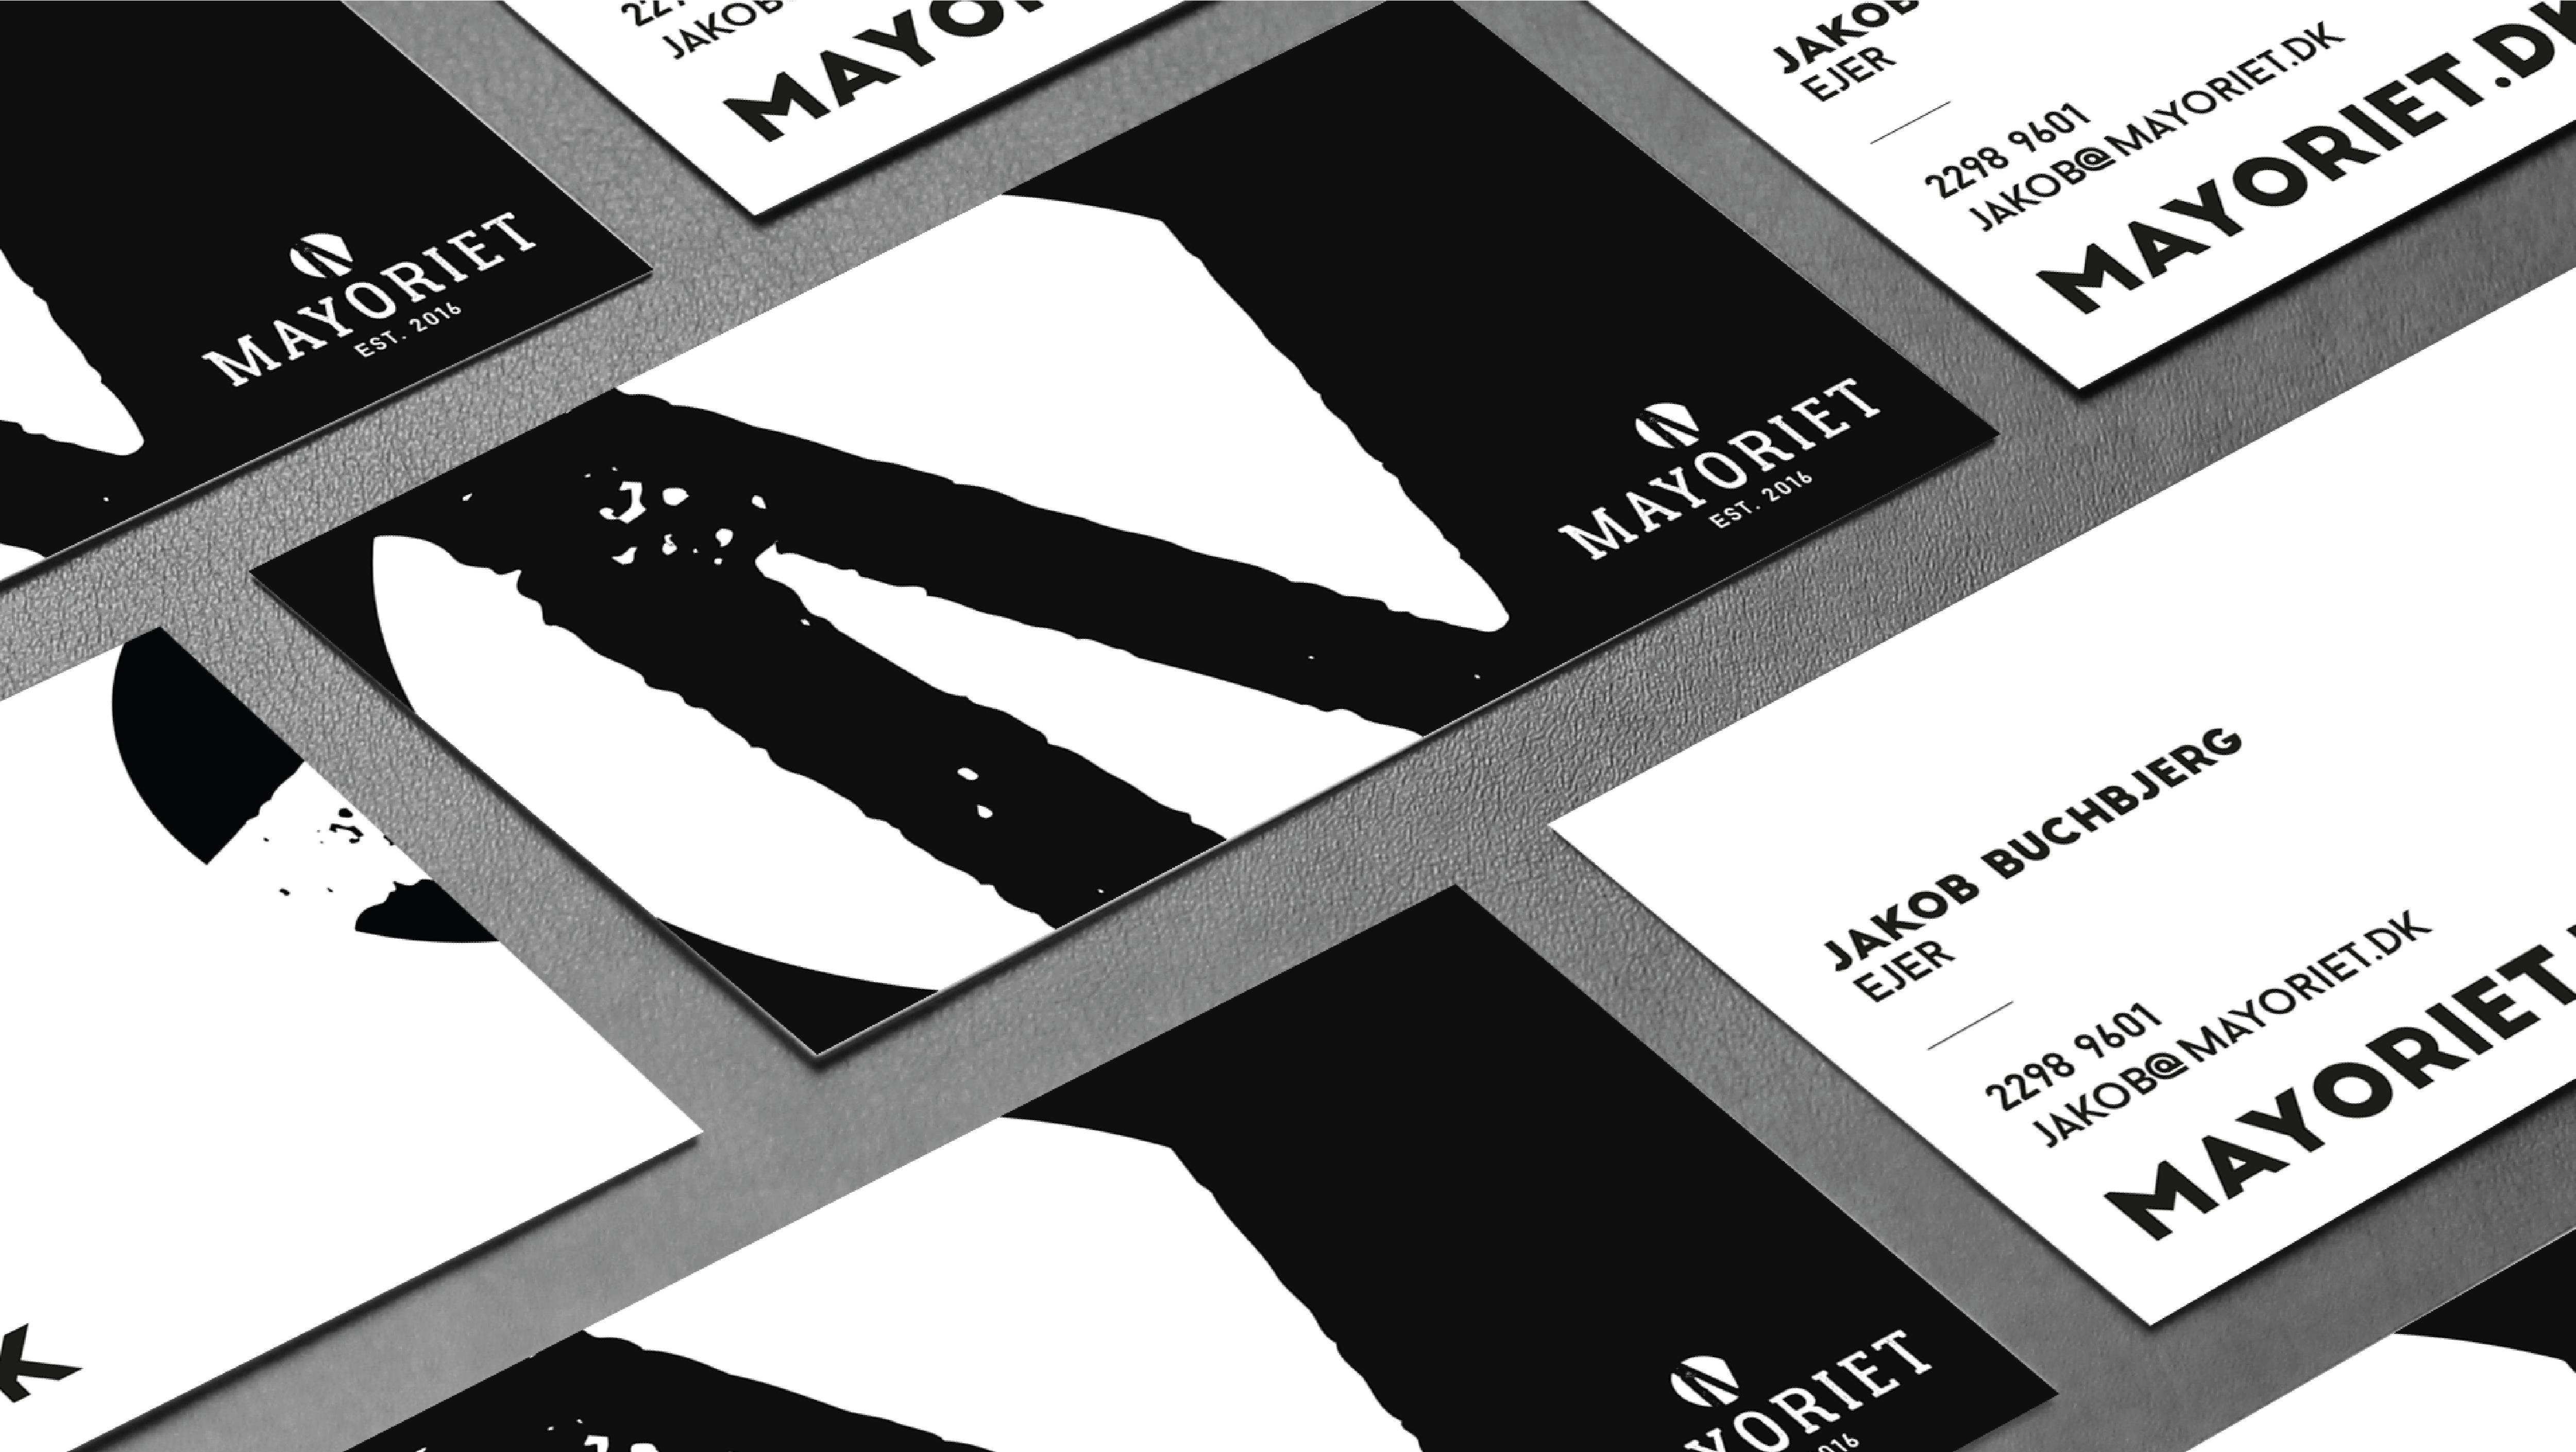 mayoriet, samsø, logo, visuel identitet, grafisk design, krims, maria refsgaard